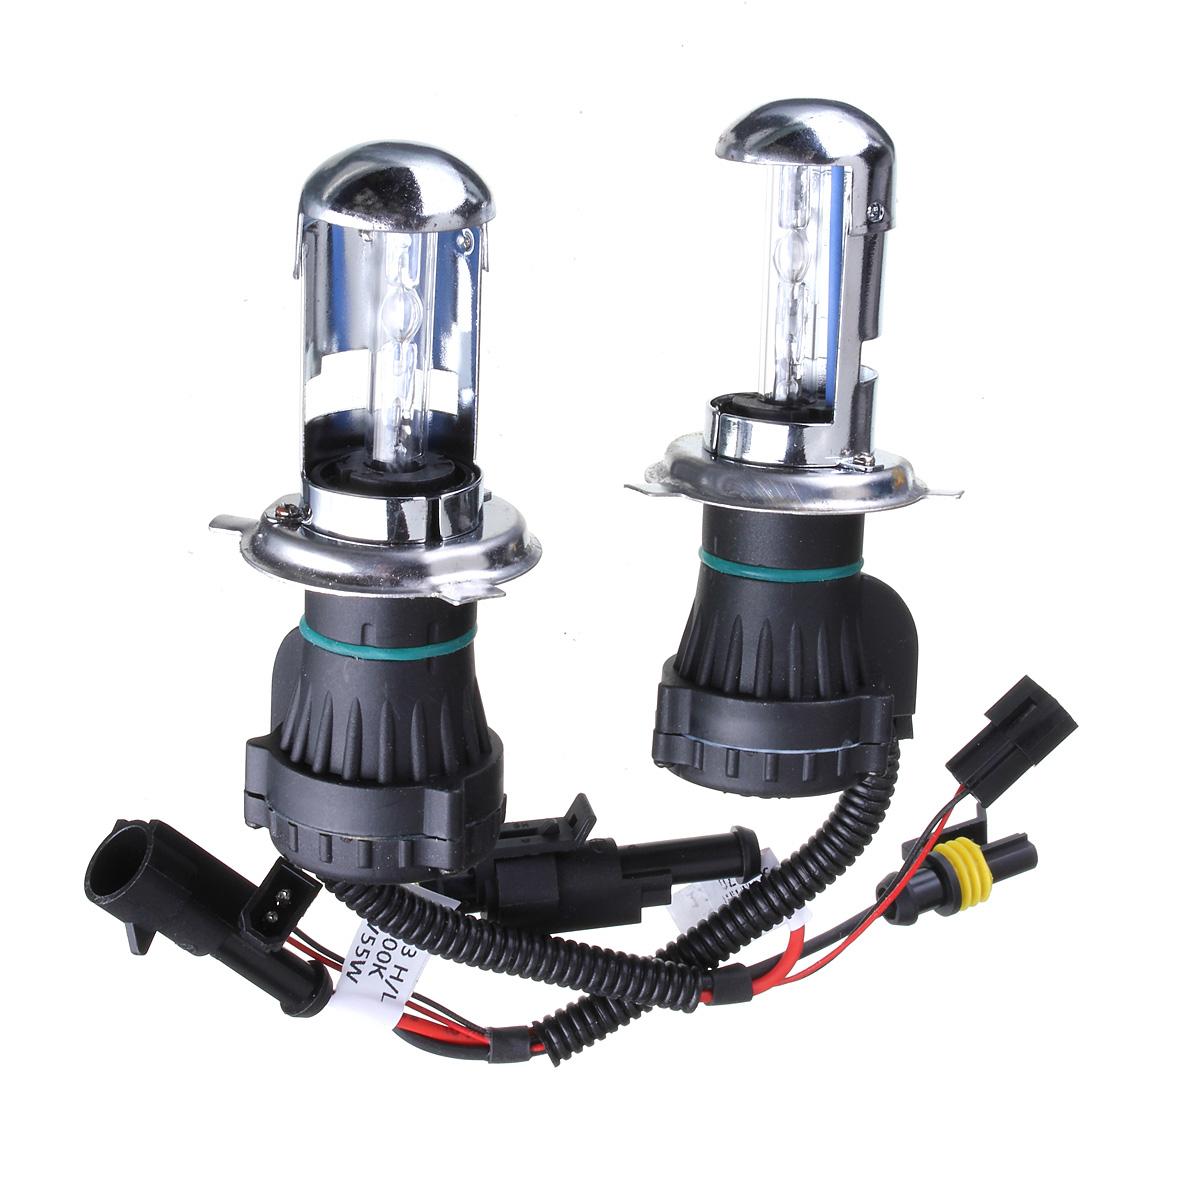 2x h4 55w hi low dual beam hid bi xenon bulb lamp light conversion slim kit 12000k export. Black Bedroom Furniture Sets. Home Design Ideas